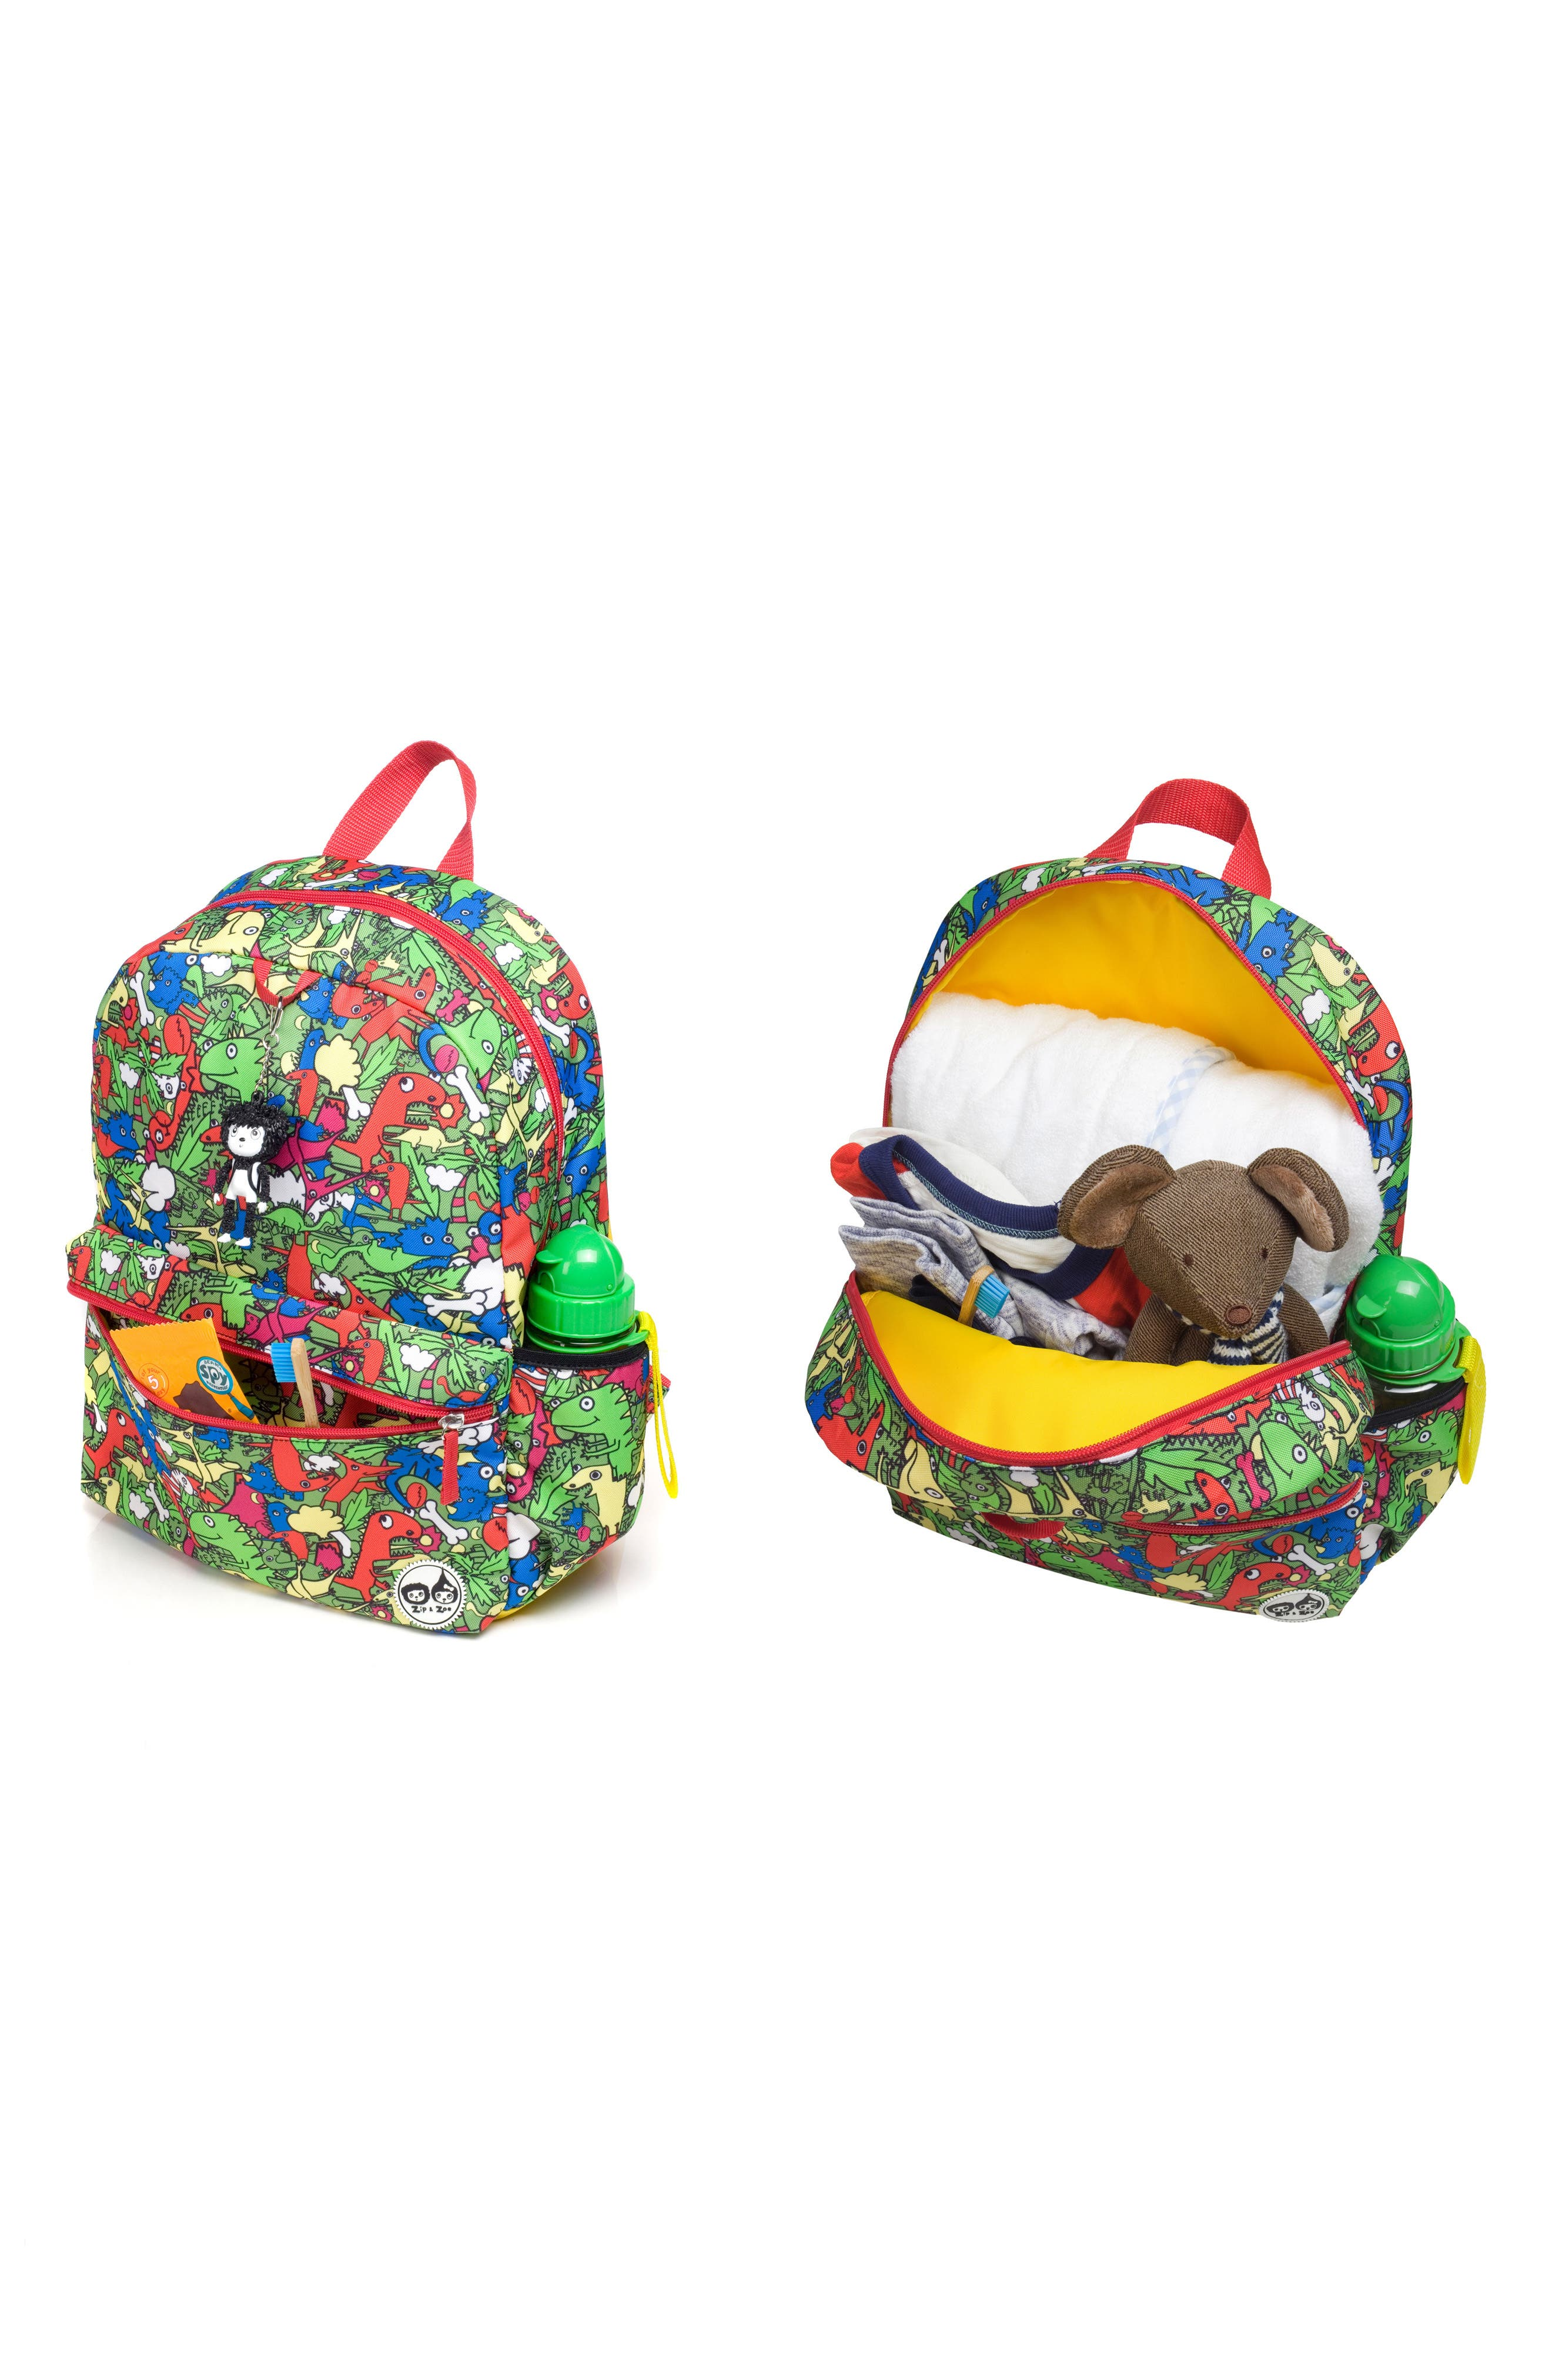 Zip & Zoe Junior Backpack Set,                             Alternate thumbnail 8, color,                             300